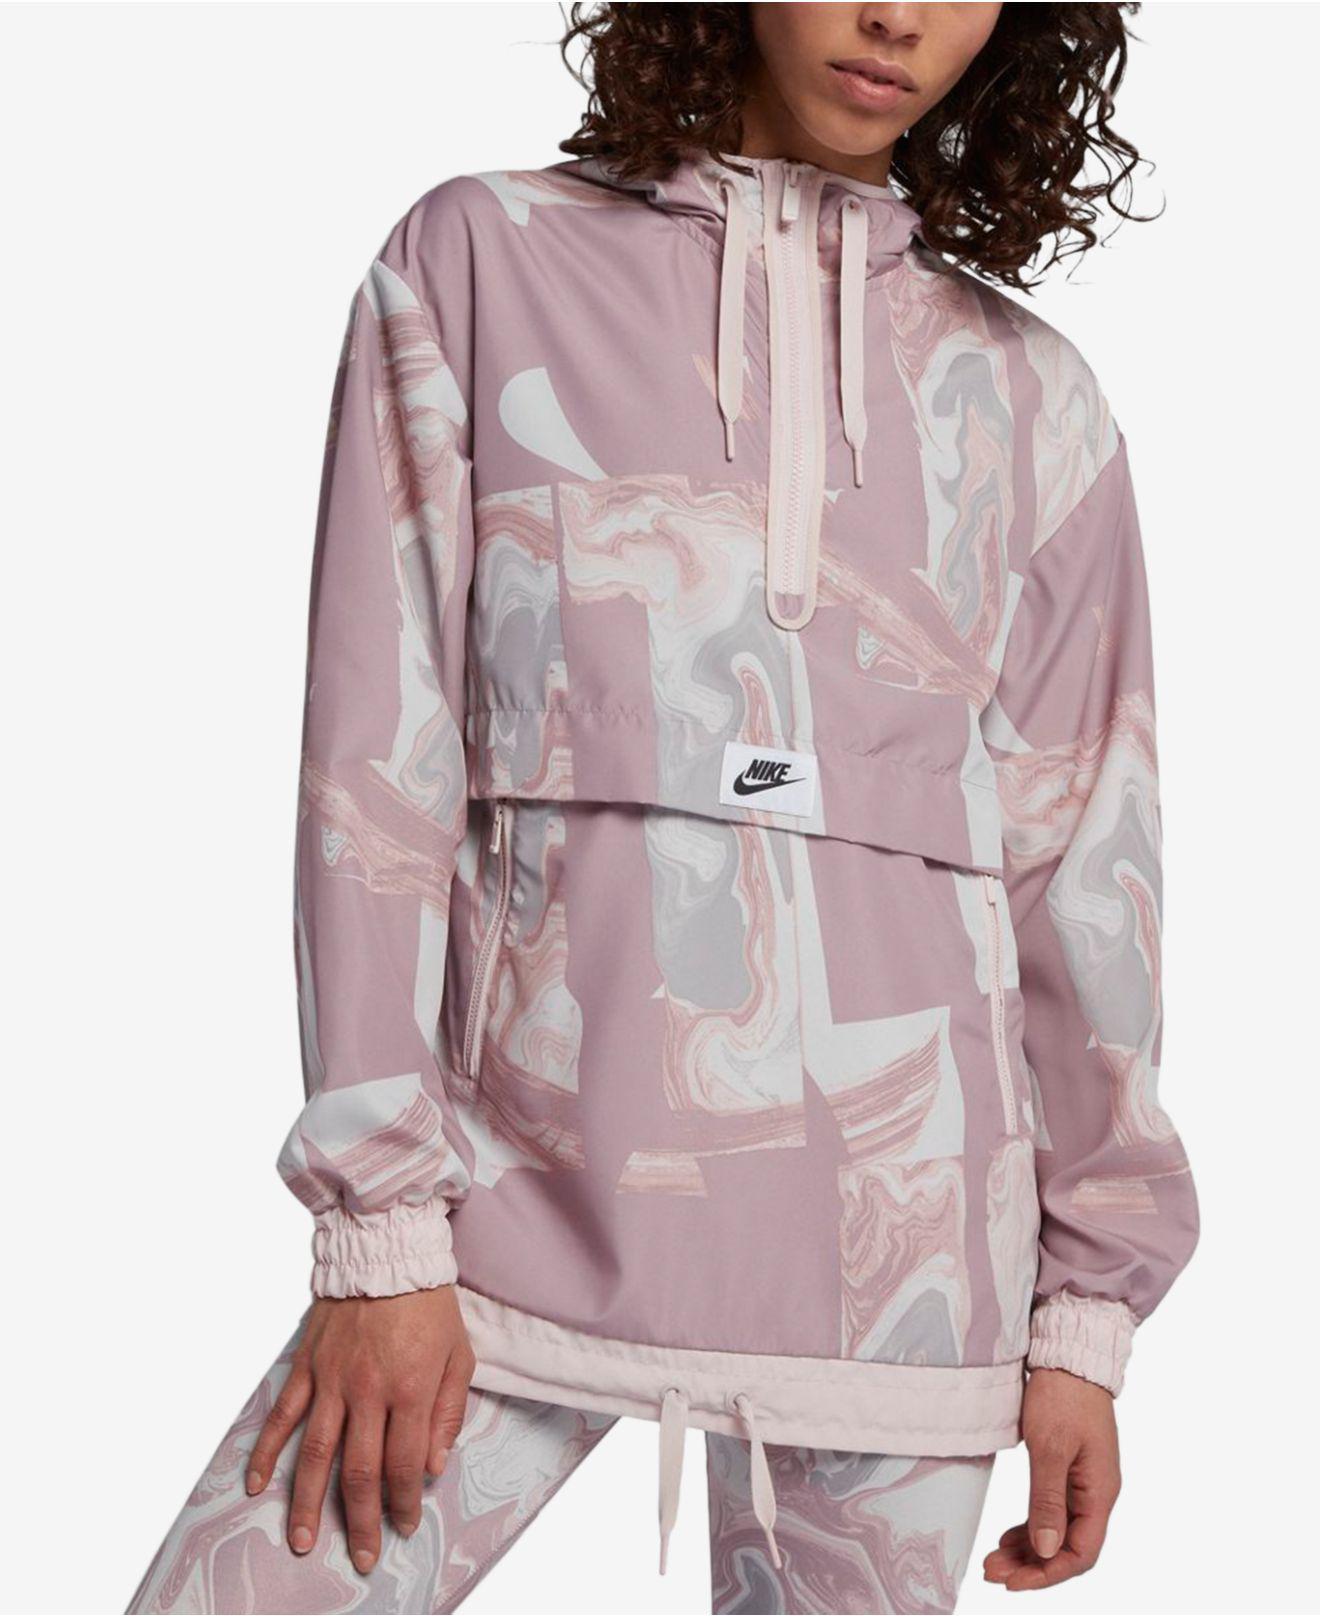 01e1ac6ee2 Lyst - Nike Sportswear Marble-print Half-zip Hooded Jacket